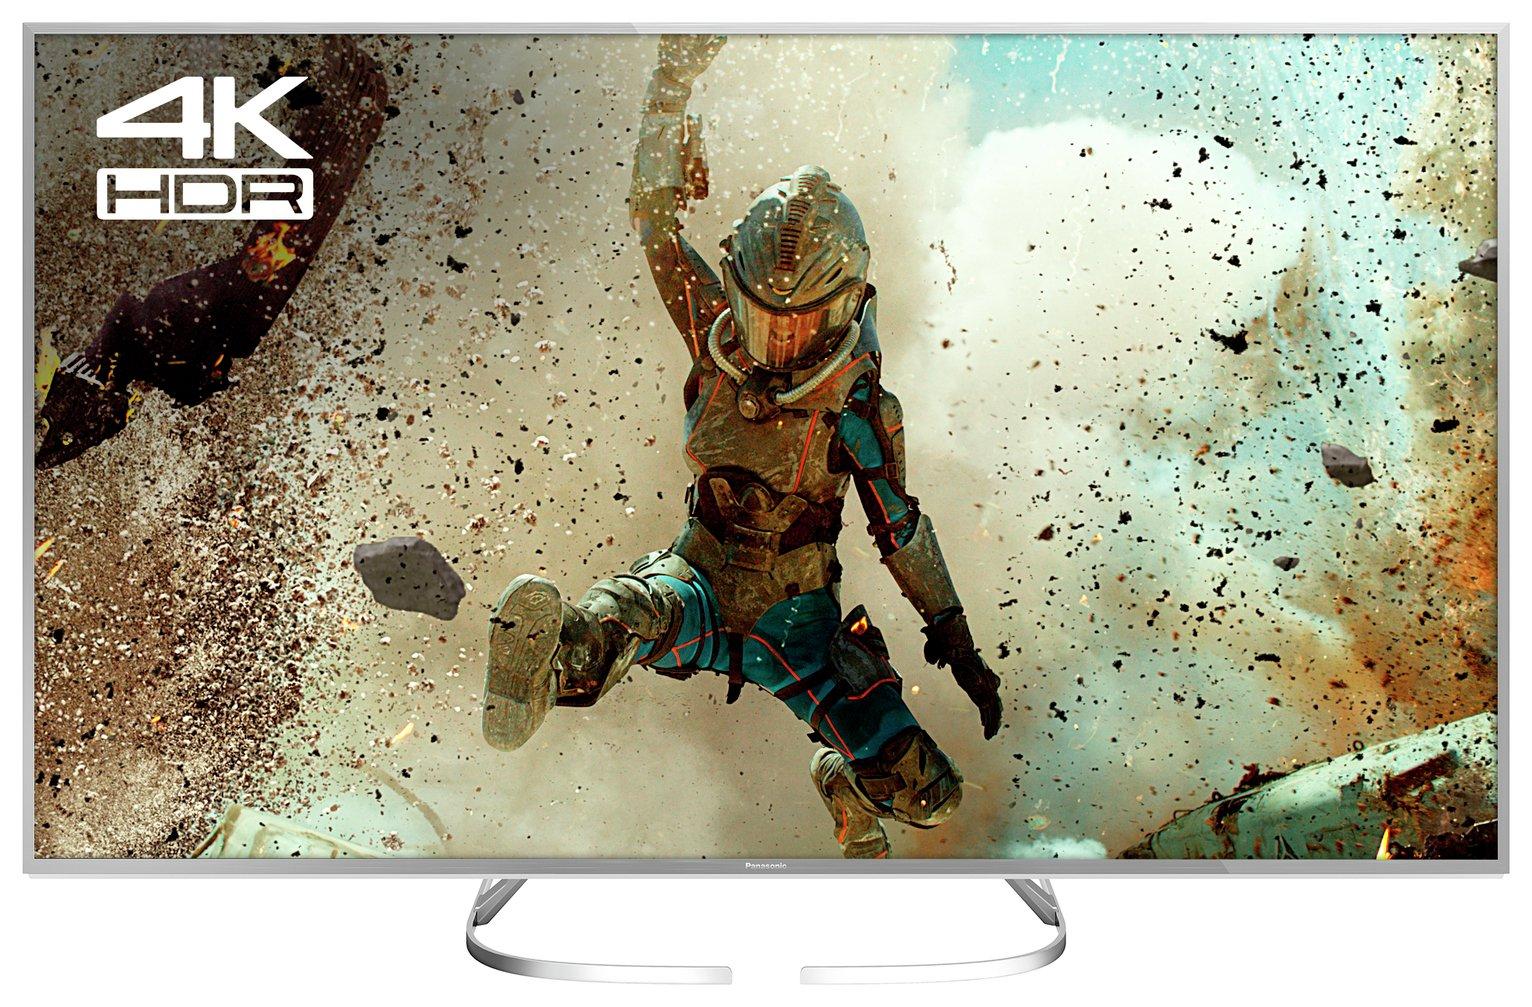 Panasonic 50TX-50EX700B 50 Inch Smart 4K UHD TV with HDR.